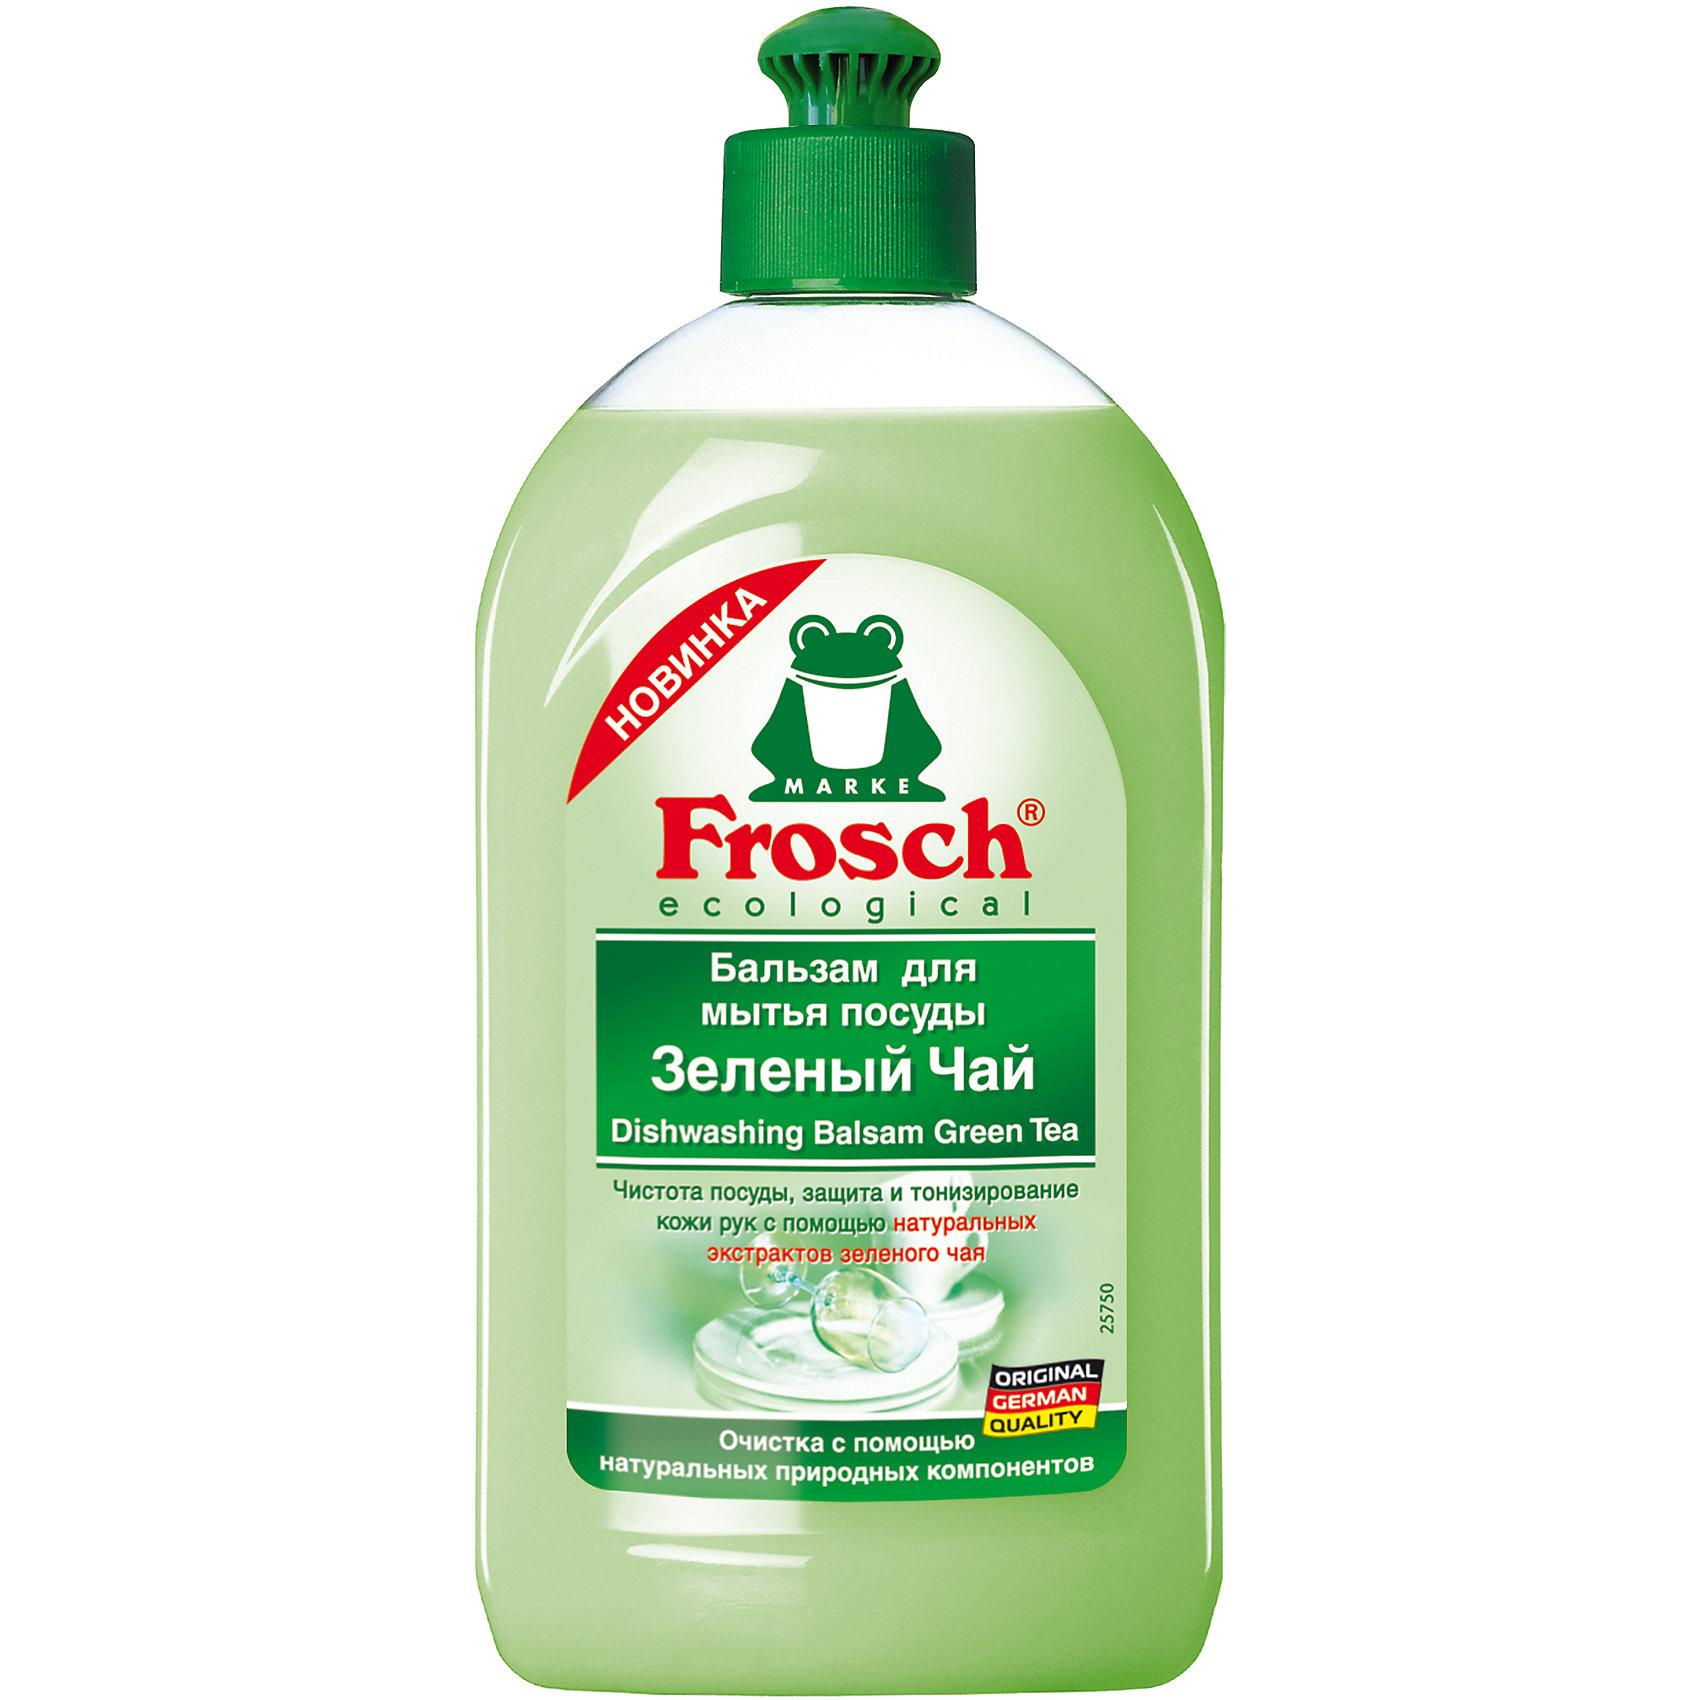 Бальзам для мытья посуды (зеленый чай), 0,5 л., Frosch (-)